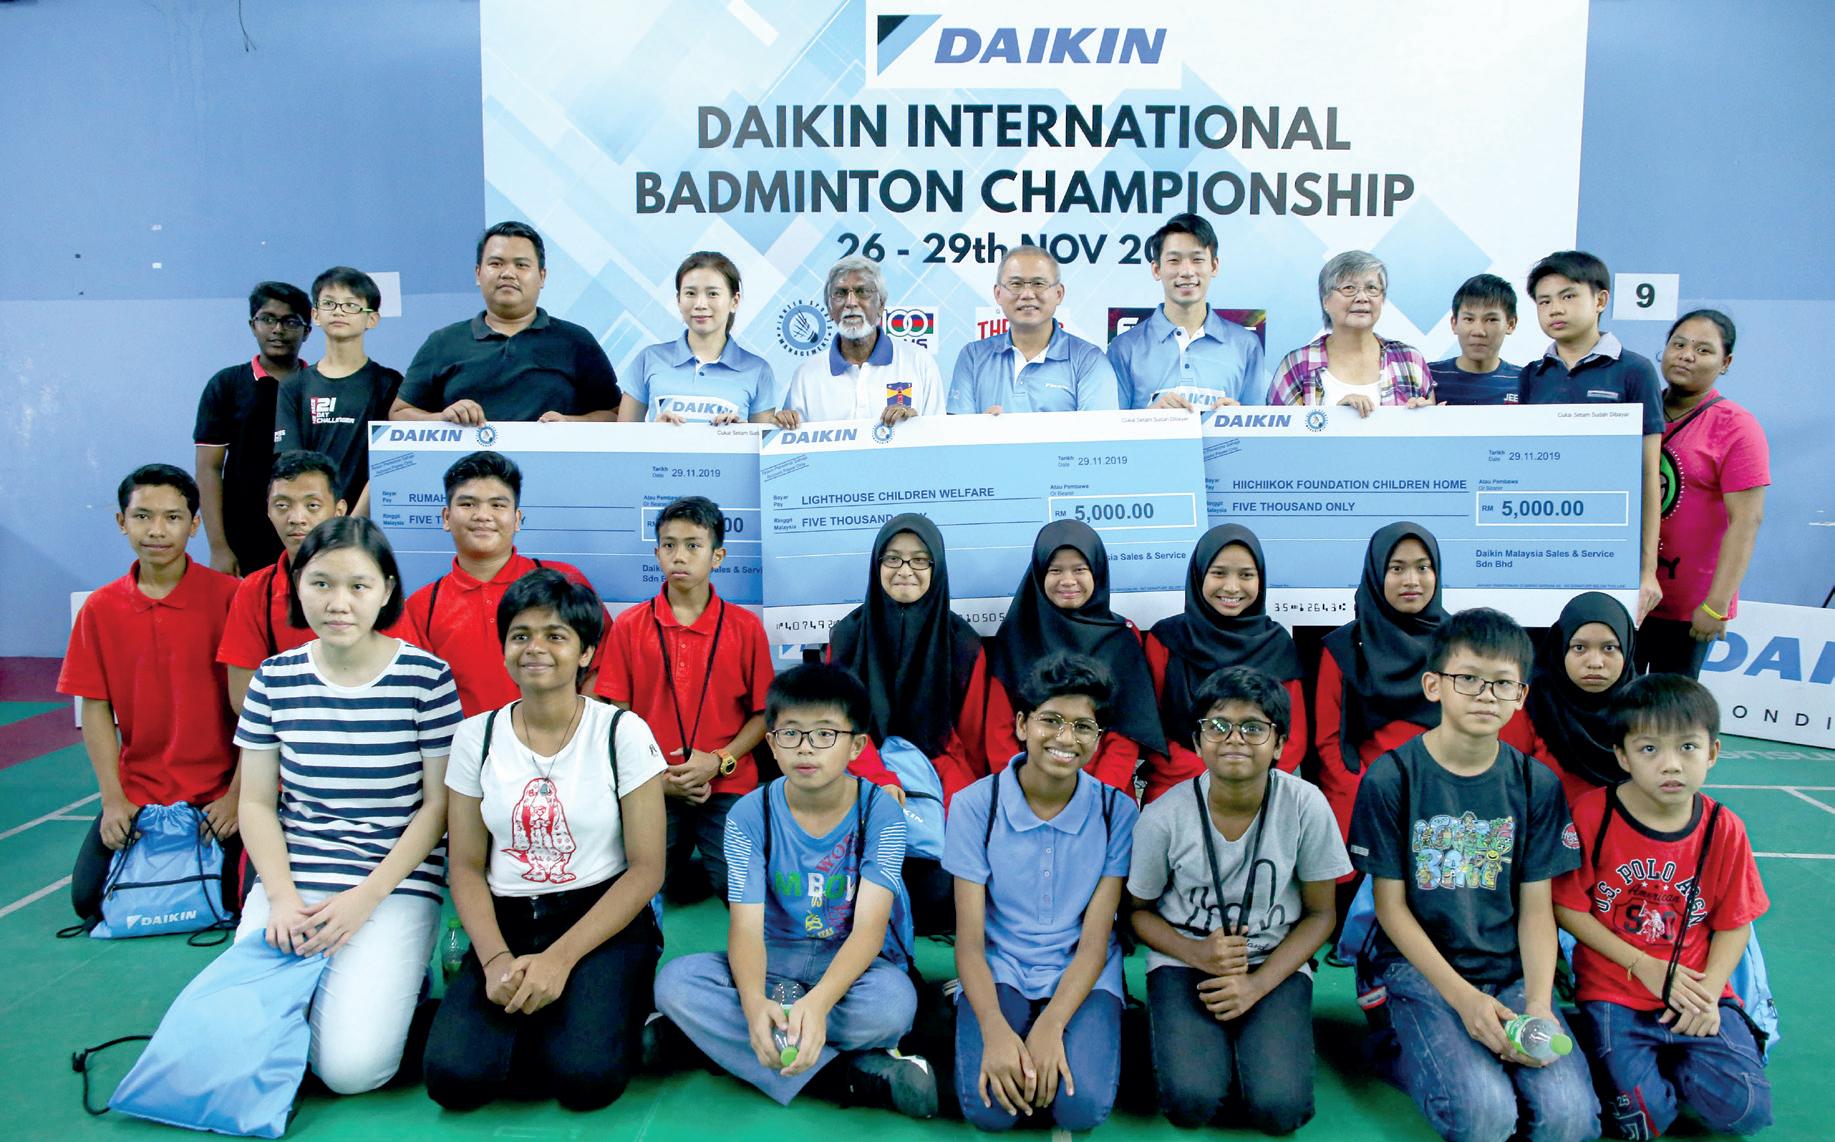 Not just another Daikin badminton tournament